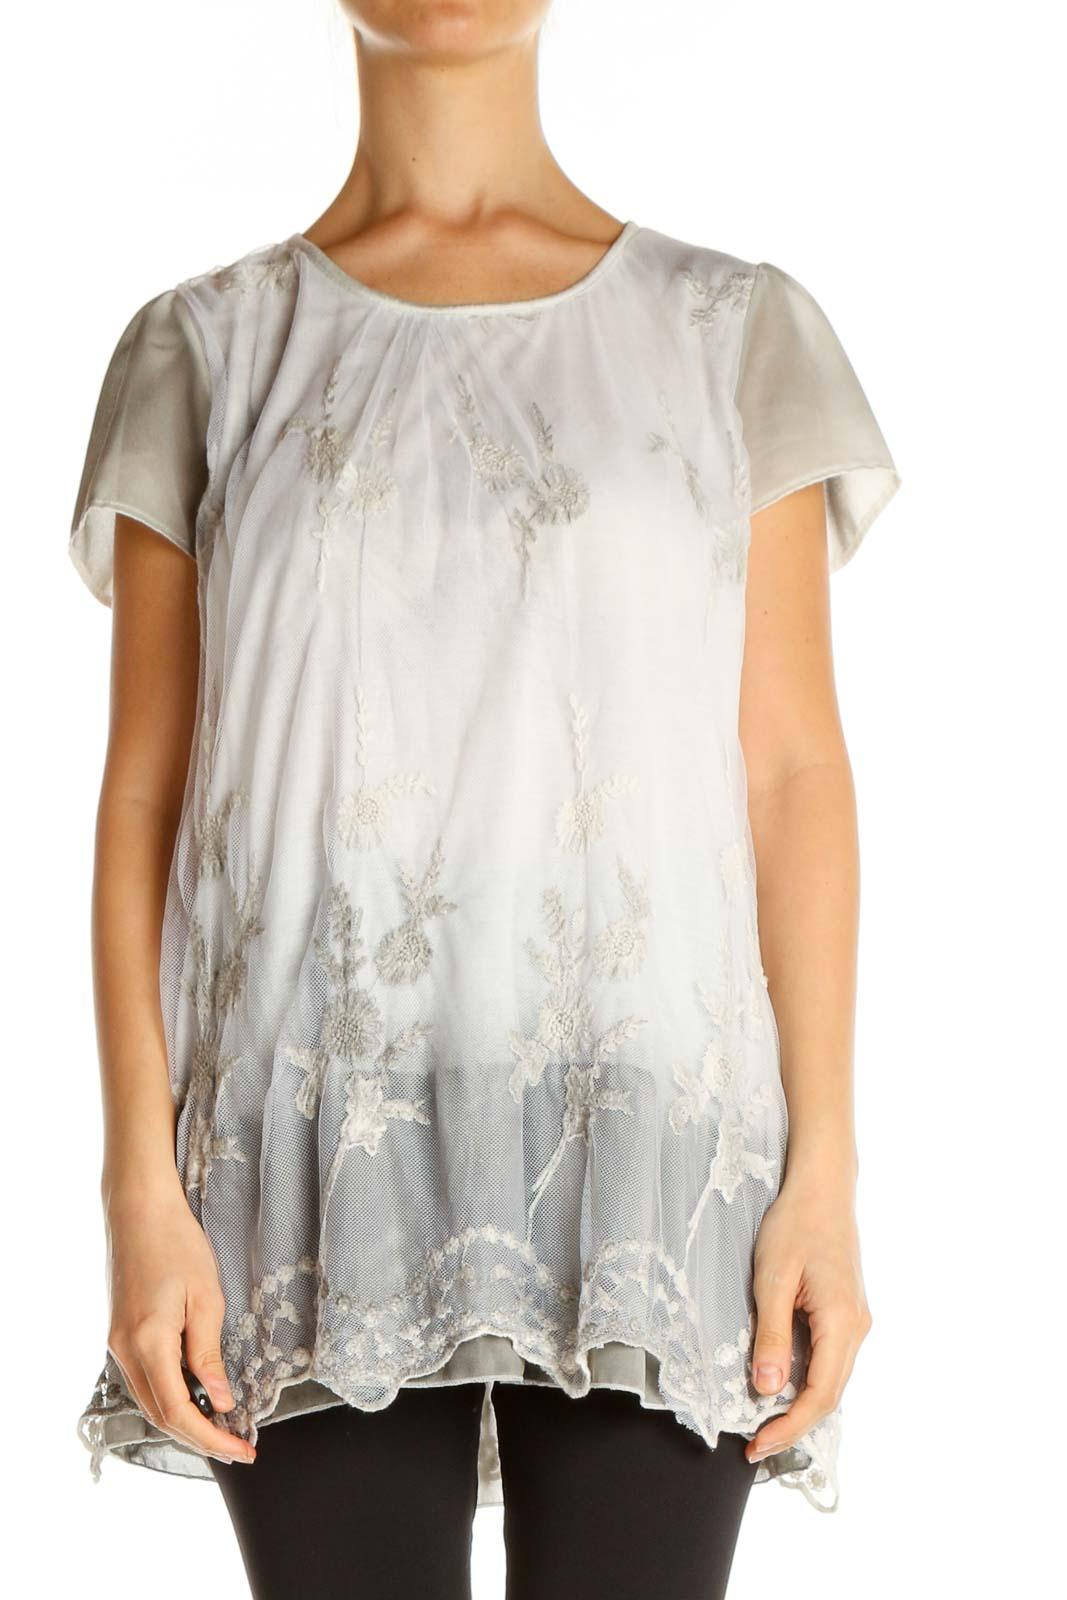 White Lace Bohemian Blouse Front